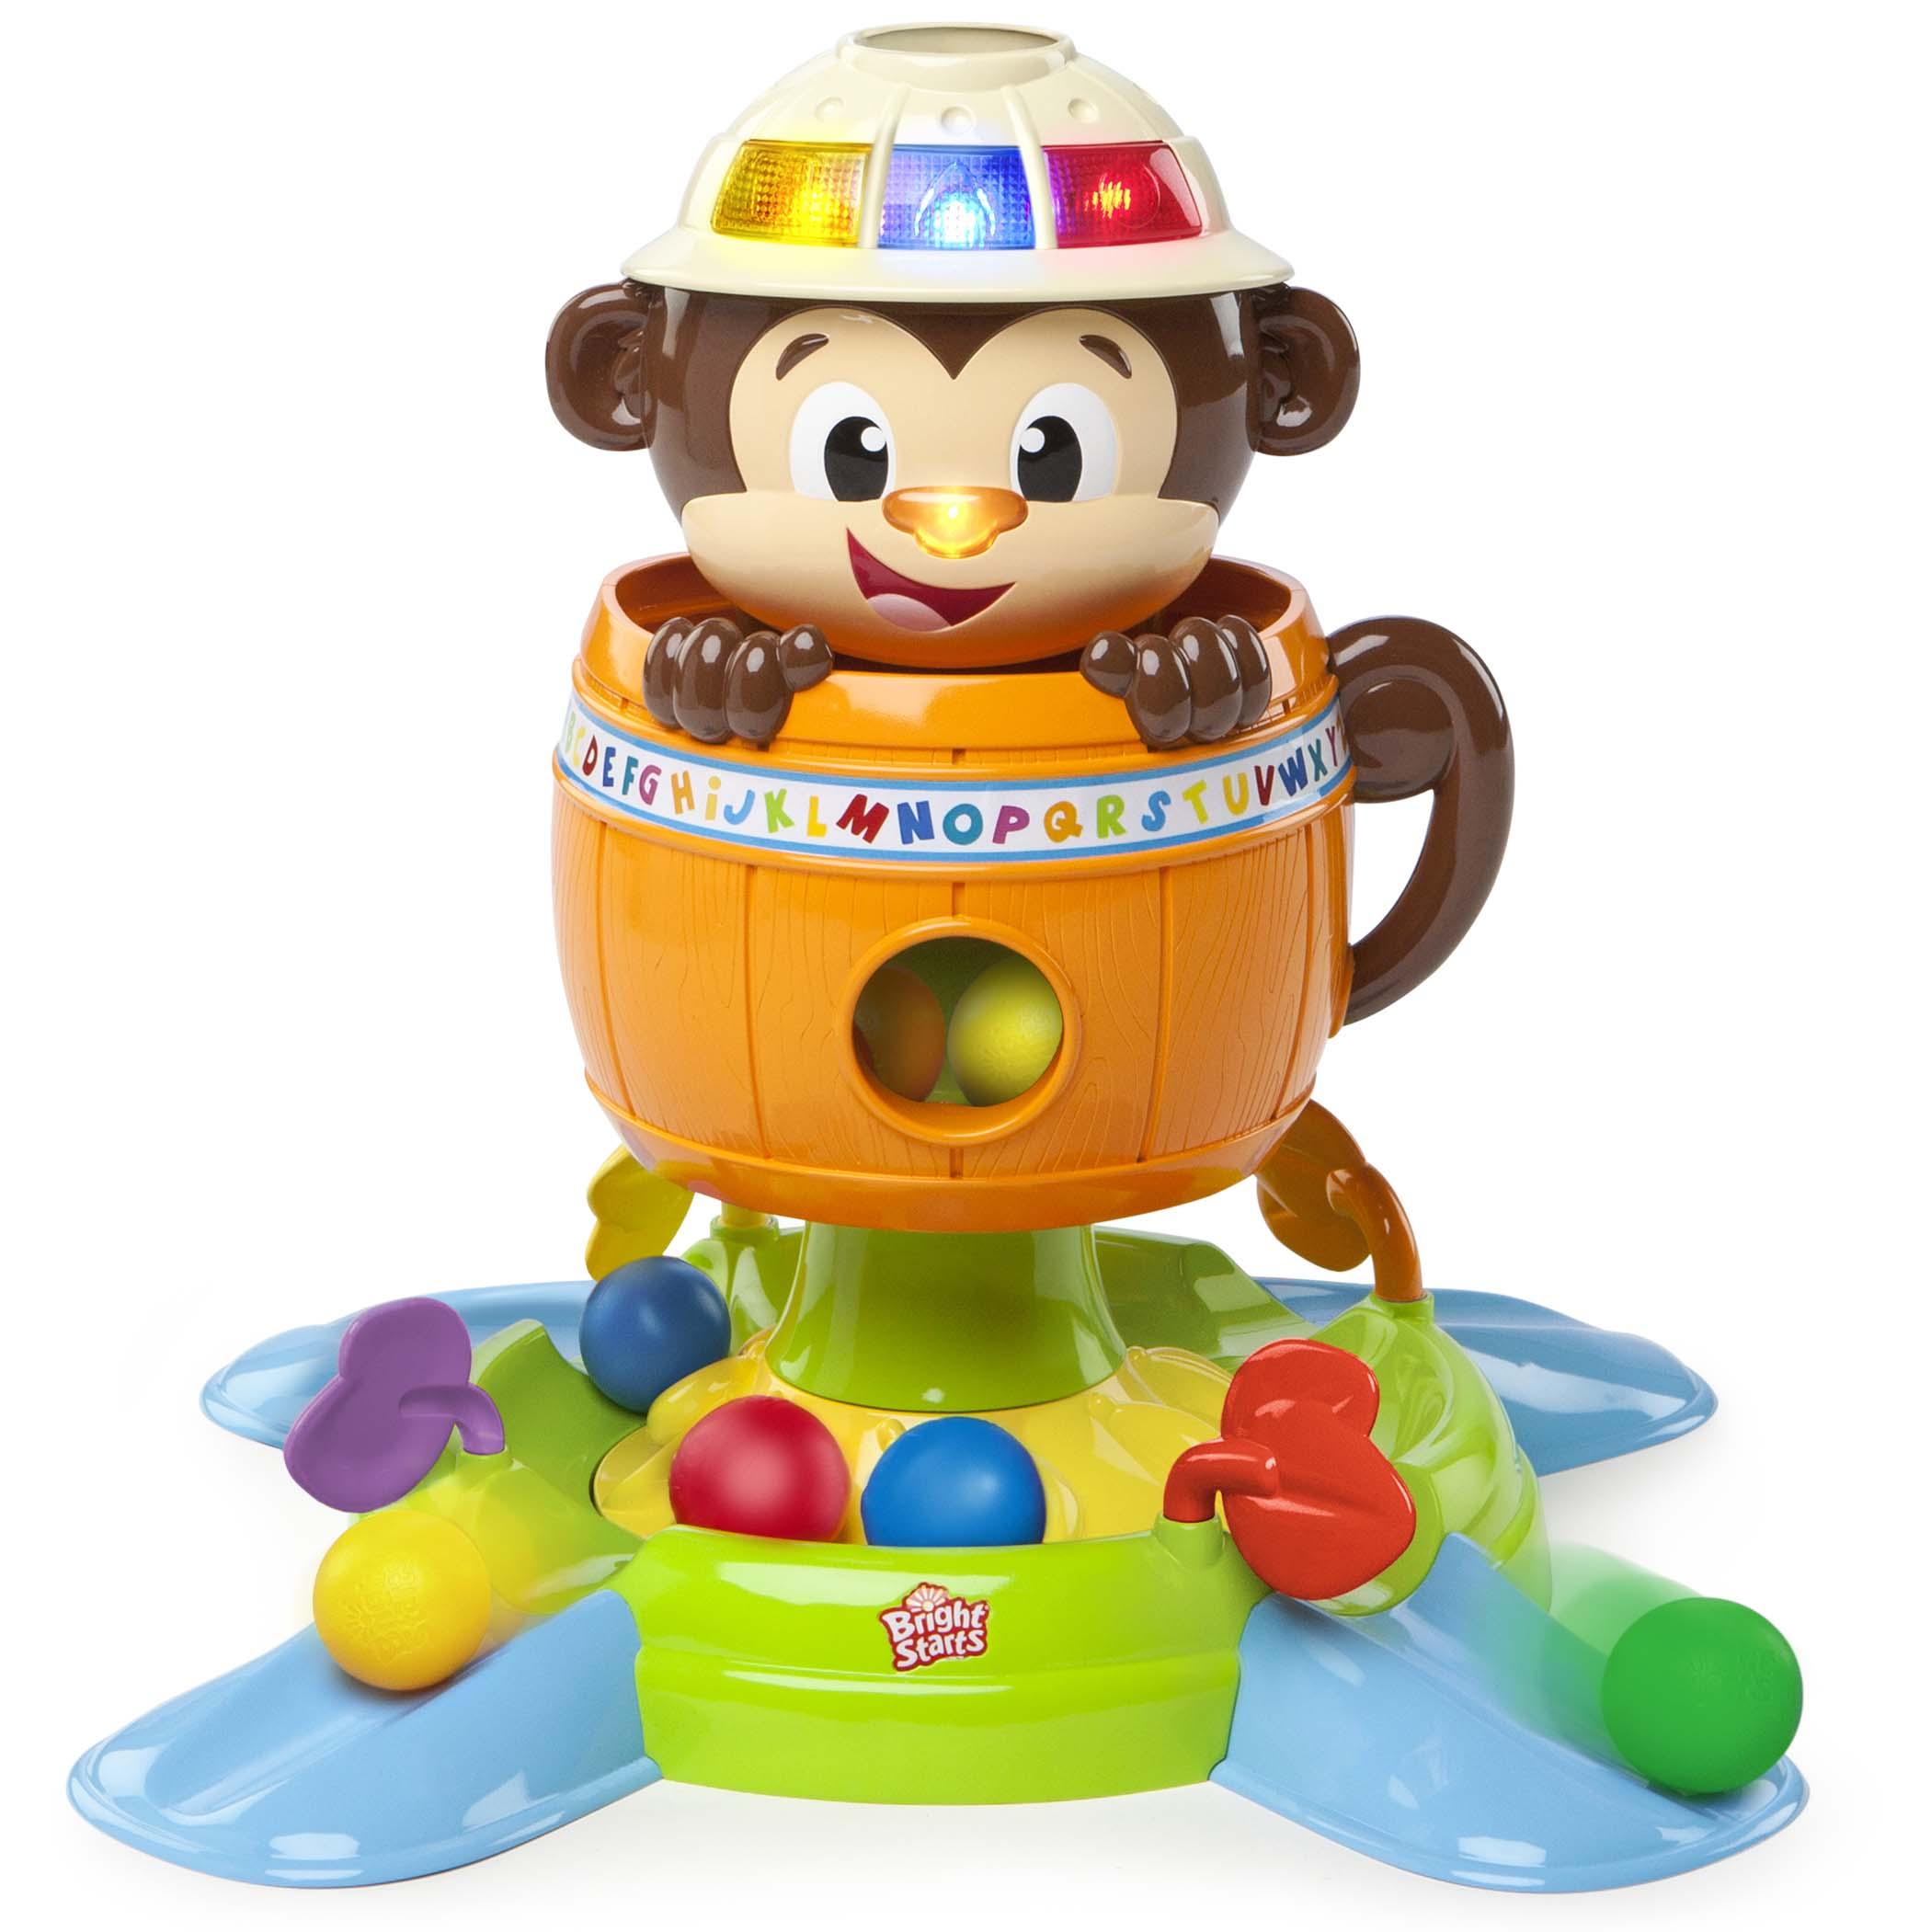 Fullsize Of Toys For 3 Month Old